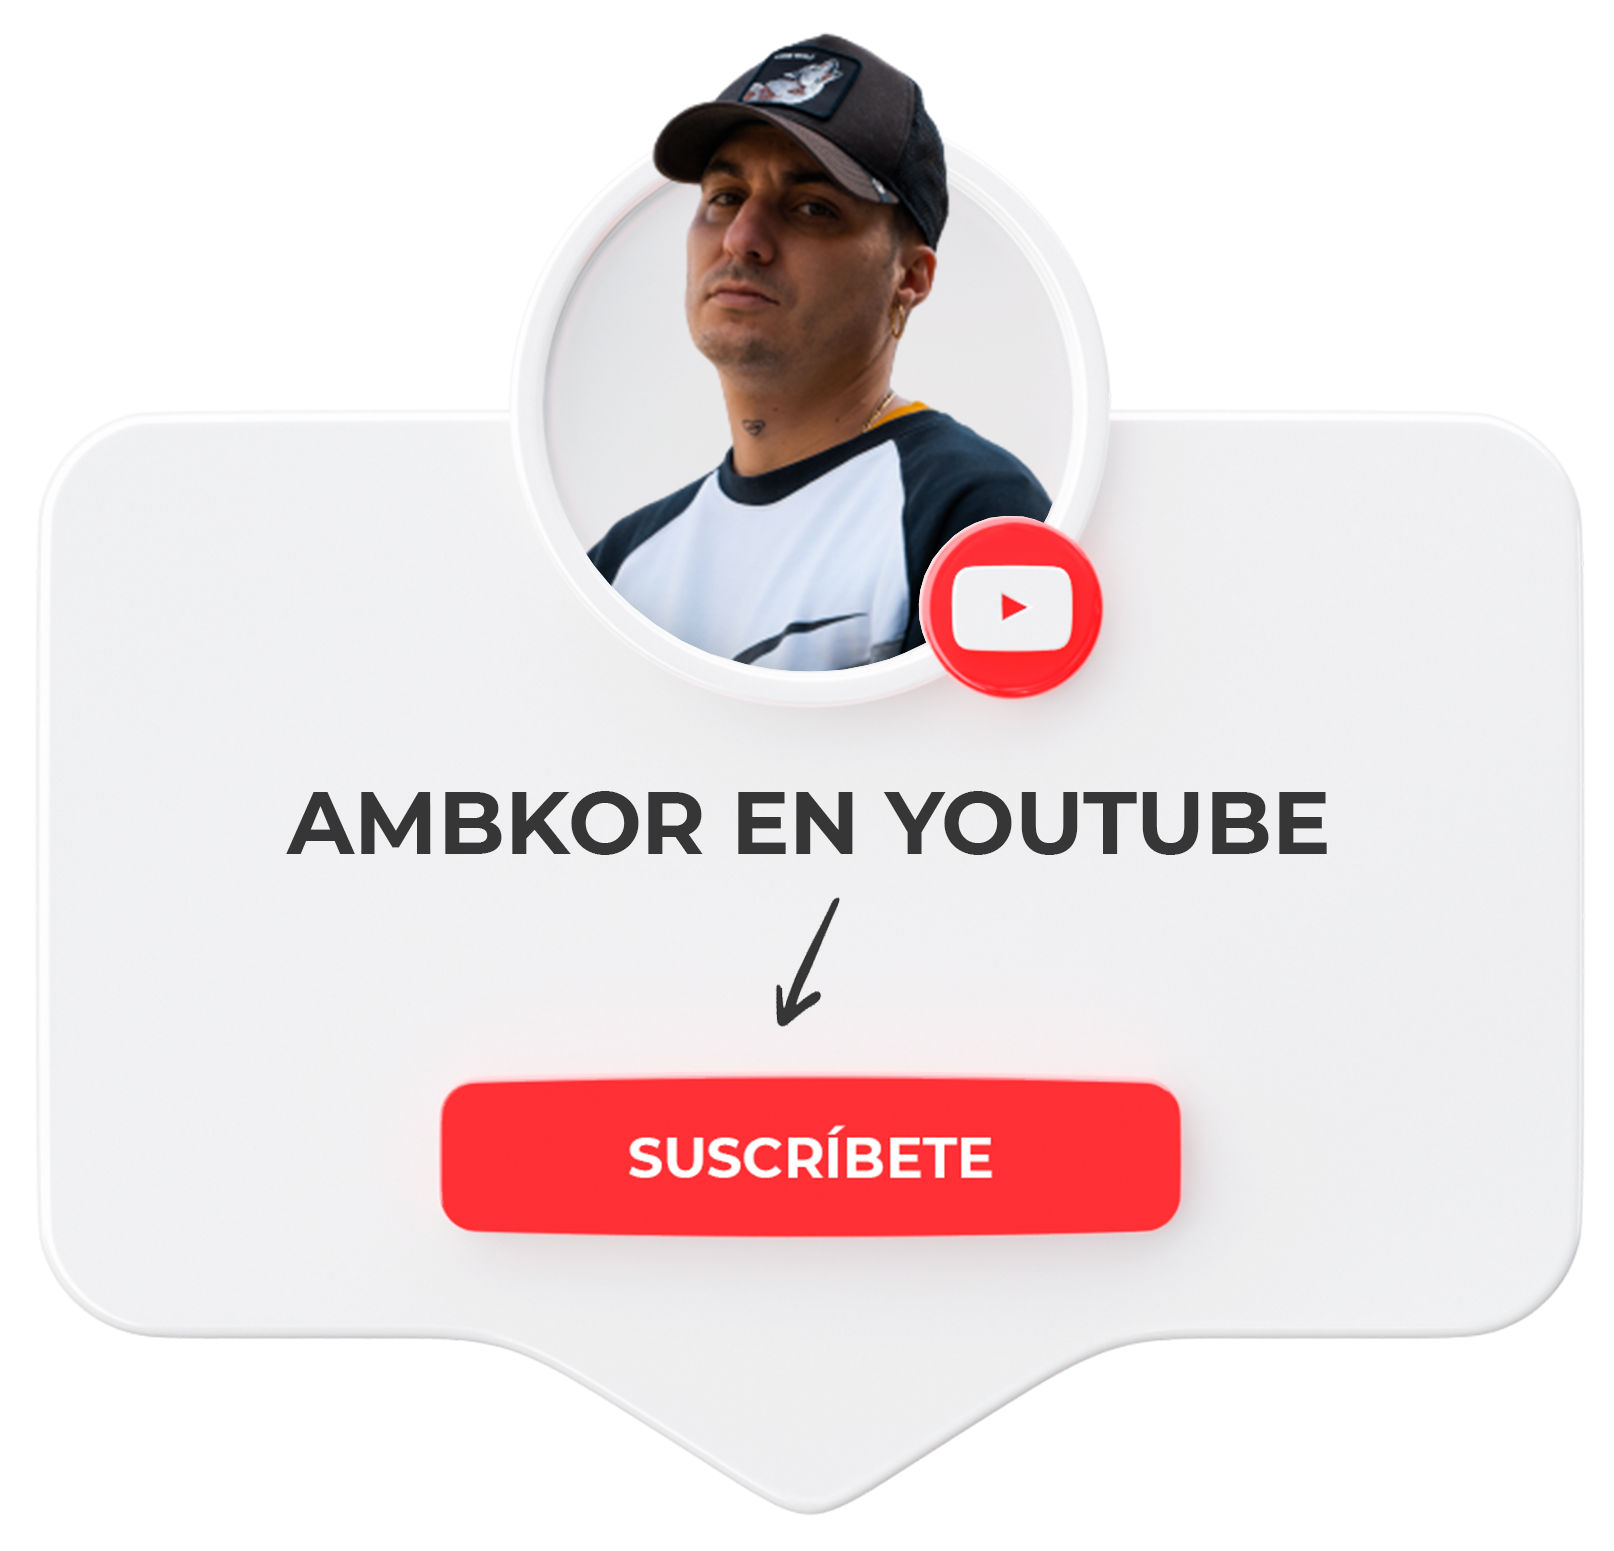 Ambkor en YouTube